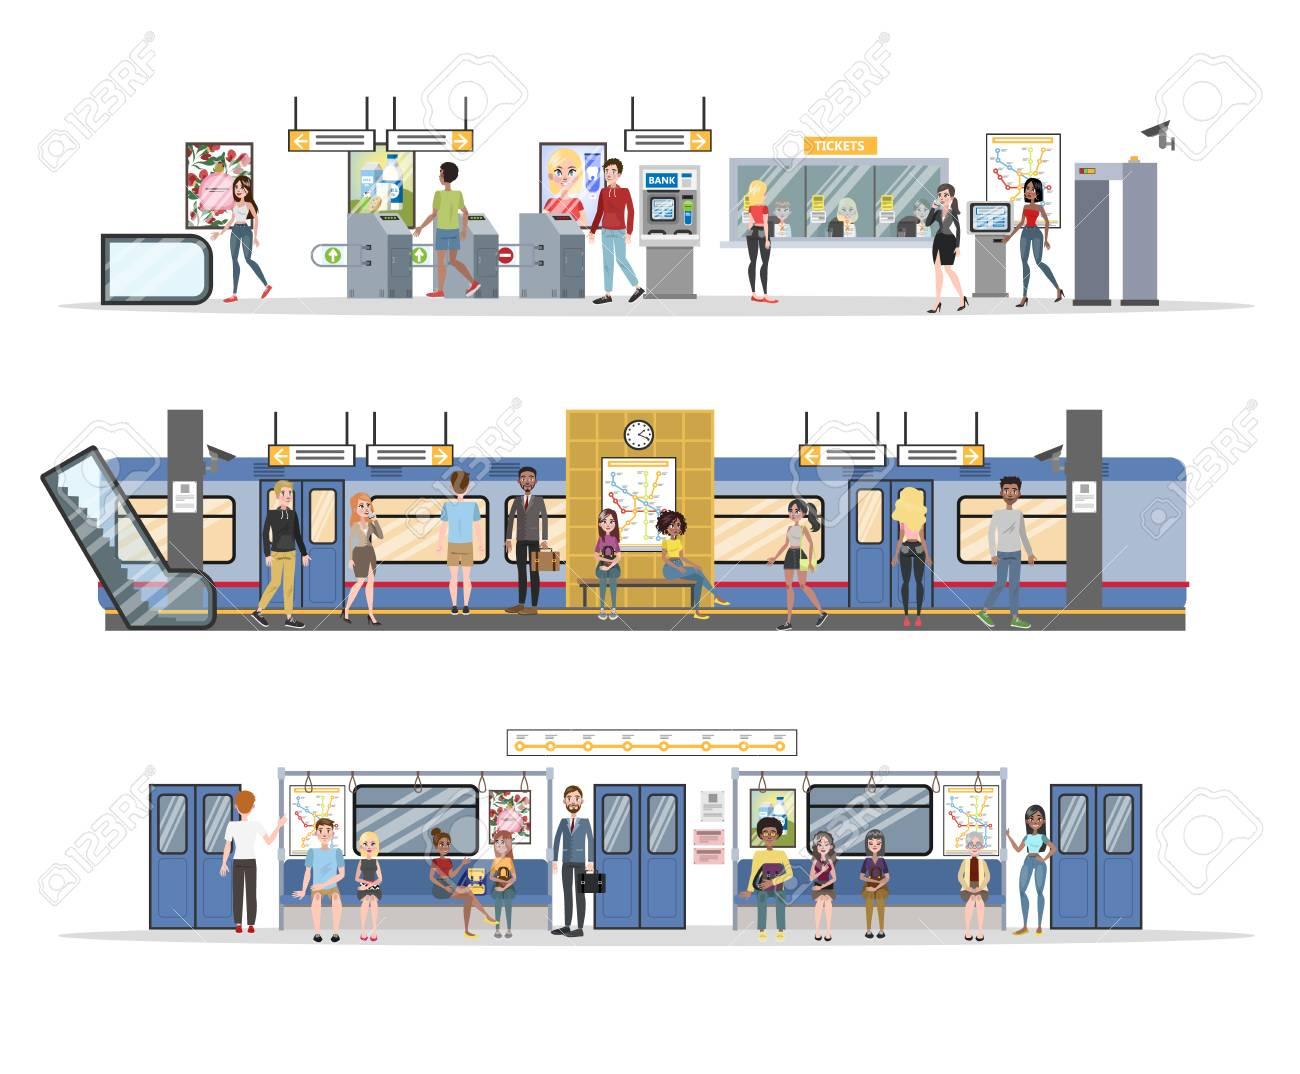 Subway interior with train and railway set - 108971600